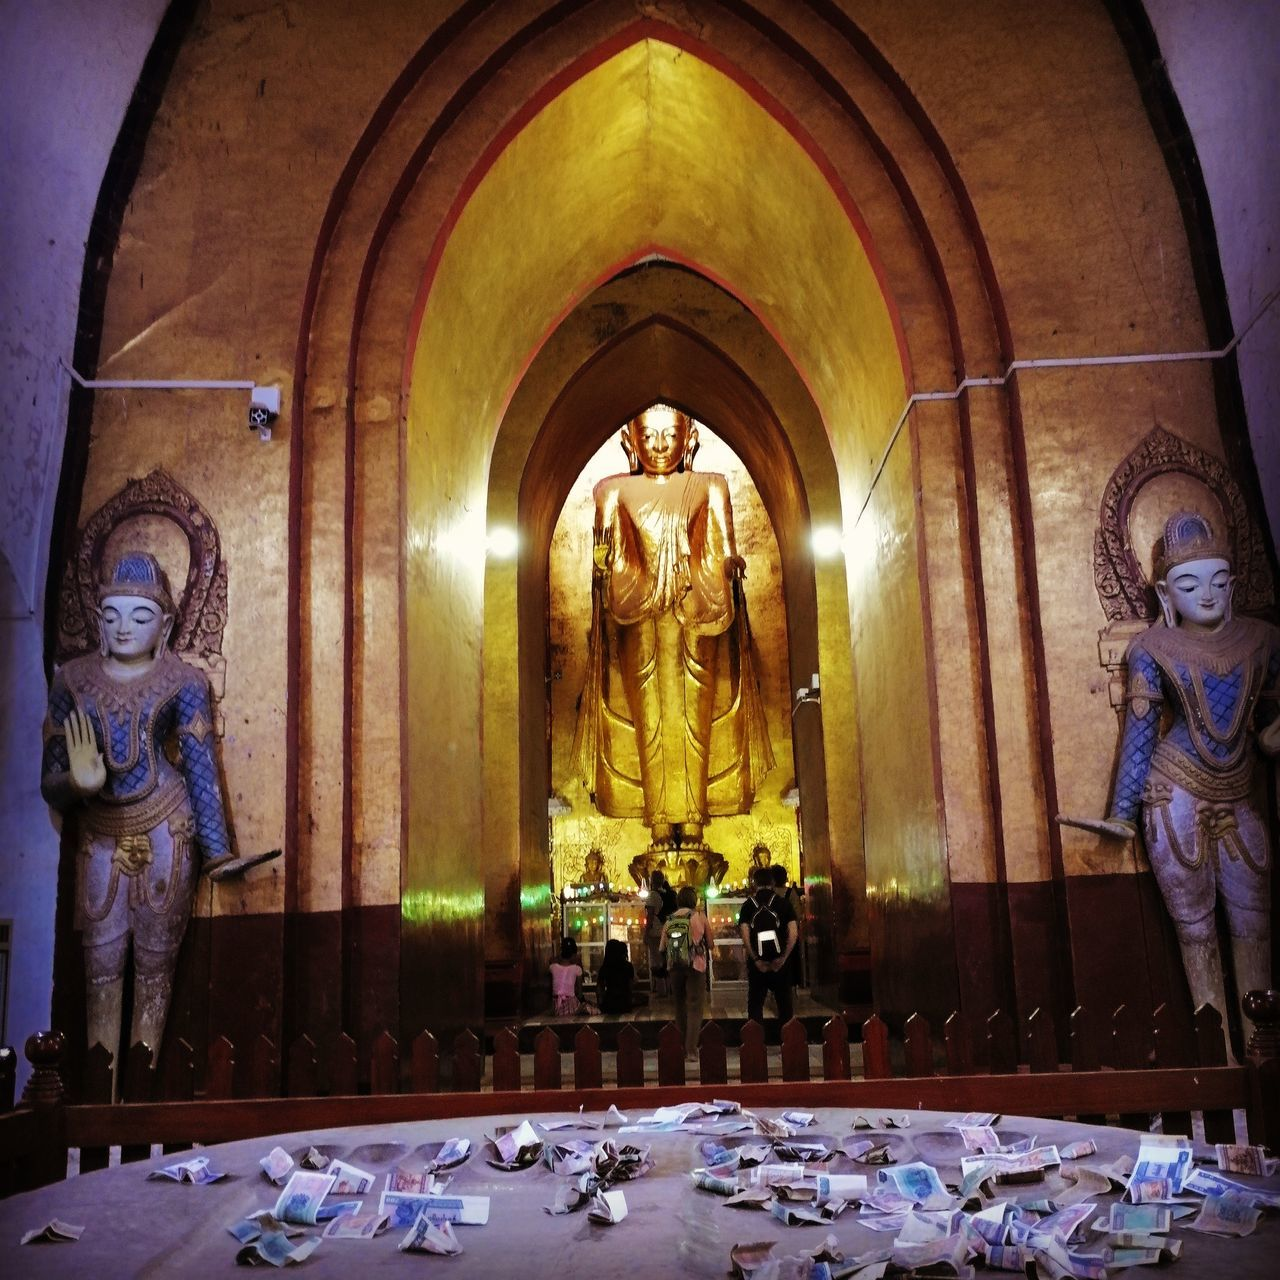 Architecture Architecture_collection Pagoda Temple Myanmar Pagoda Temple EyeEmNewHere Burma Myanmarphotos EyeEm Picture Asian  Travel Bagan Trip Bagan